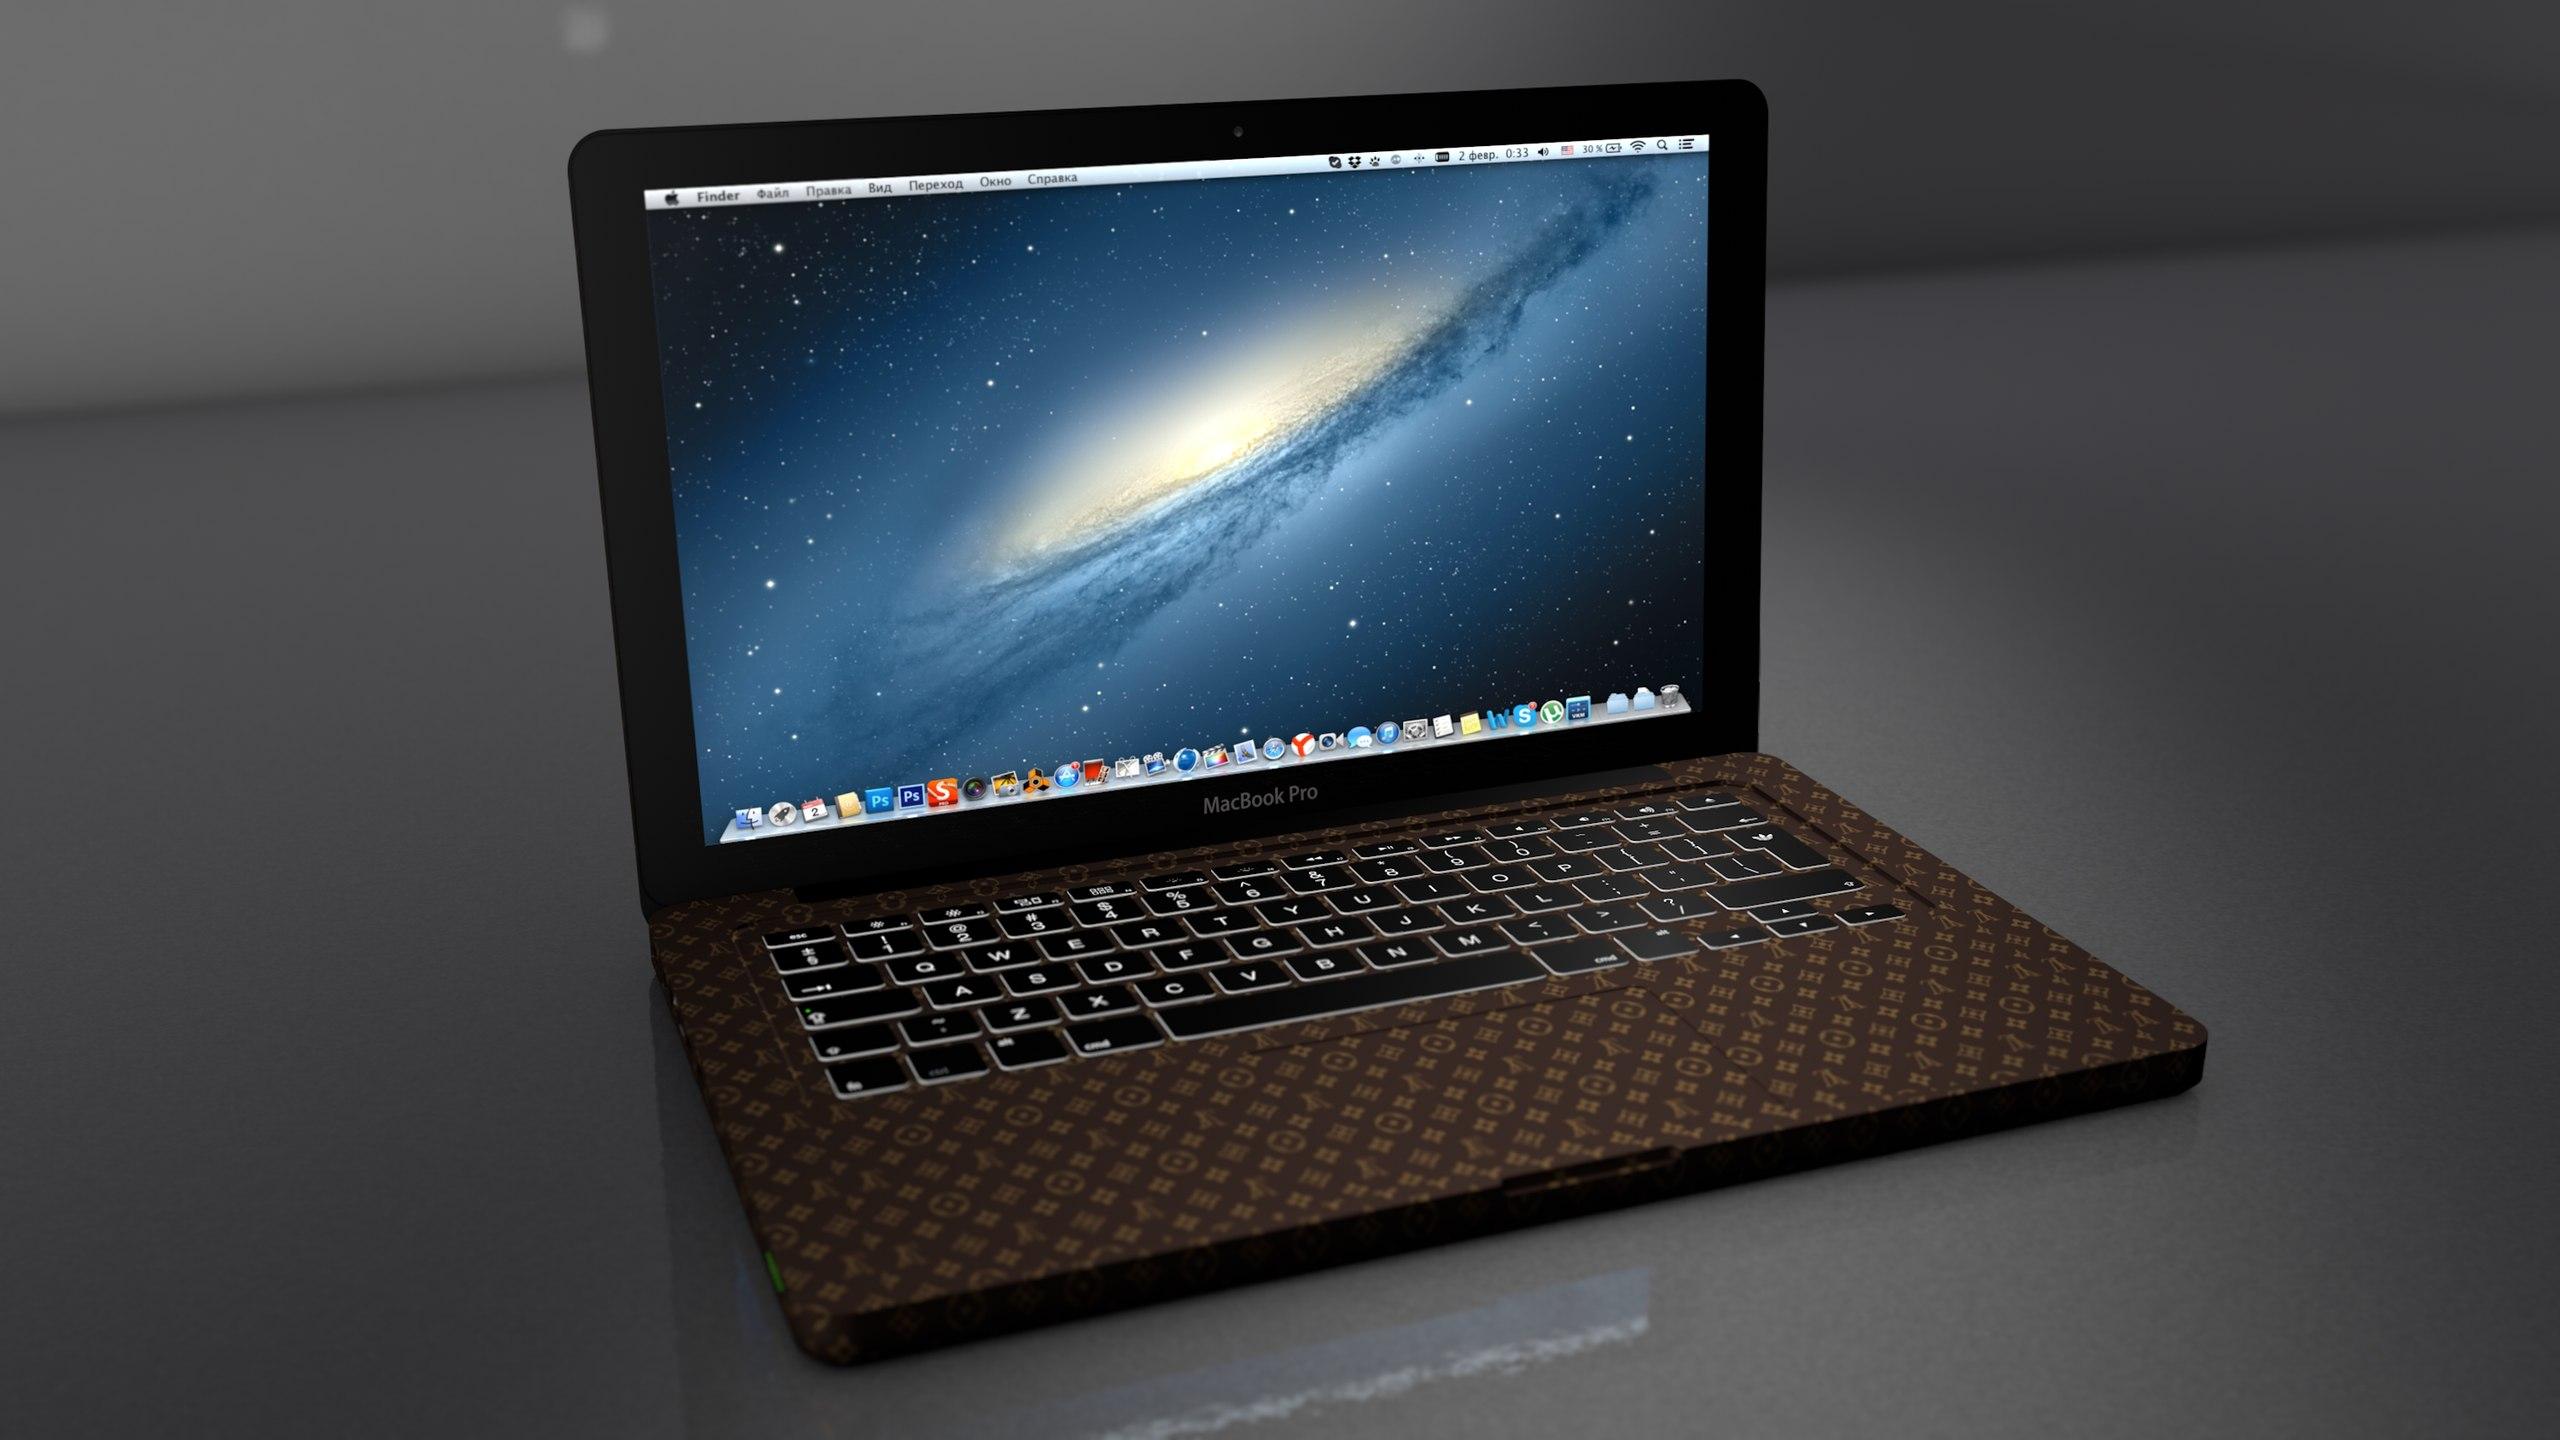 Macbook Pro HD Wallpaper Background Image 2560x1440